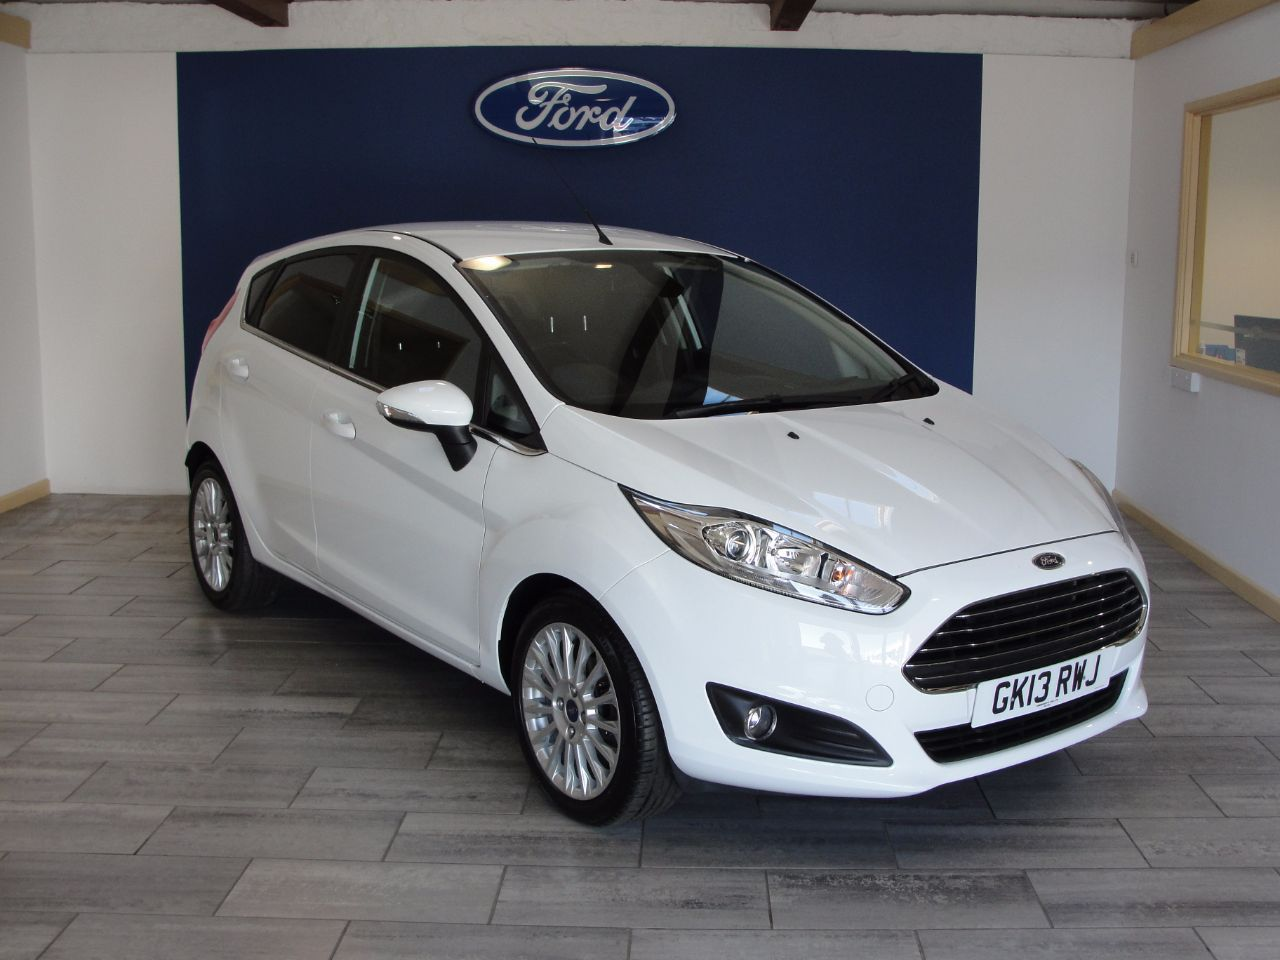 Ford Fiesta 1 0 Ecoboost 125 Titanium 5dr Hatchback Petrol White